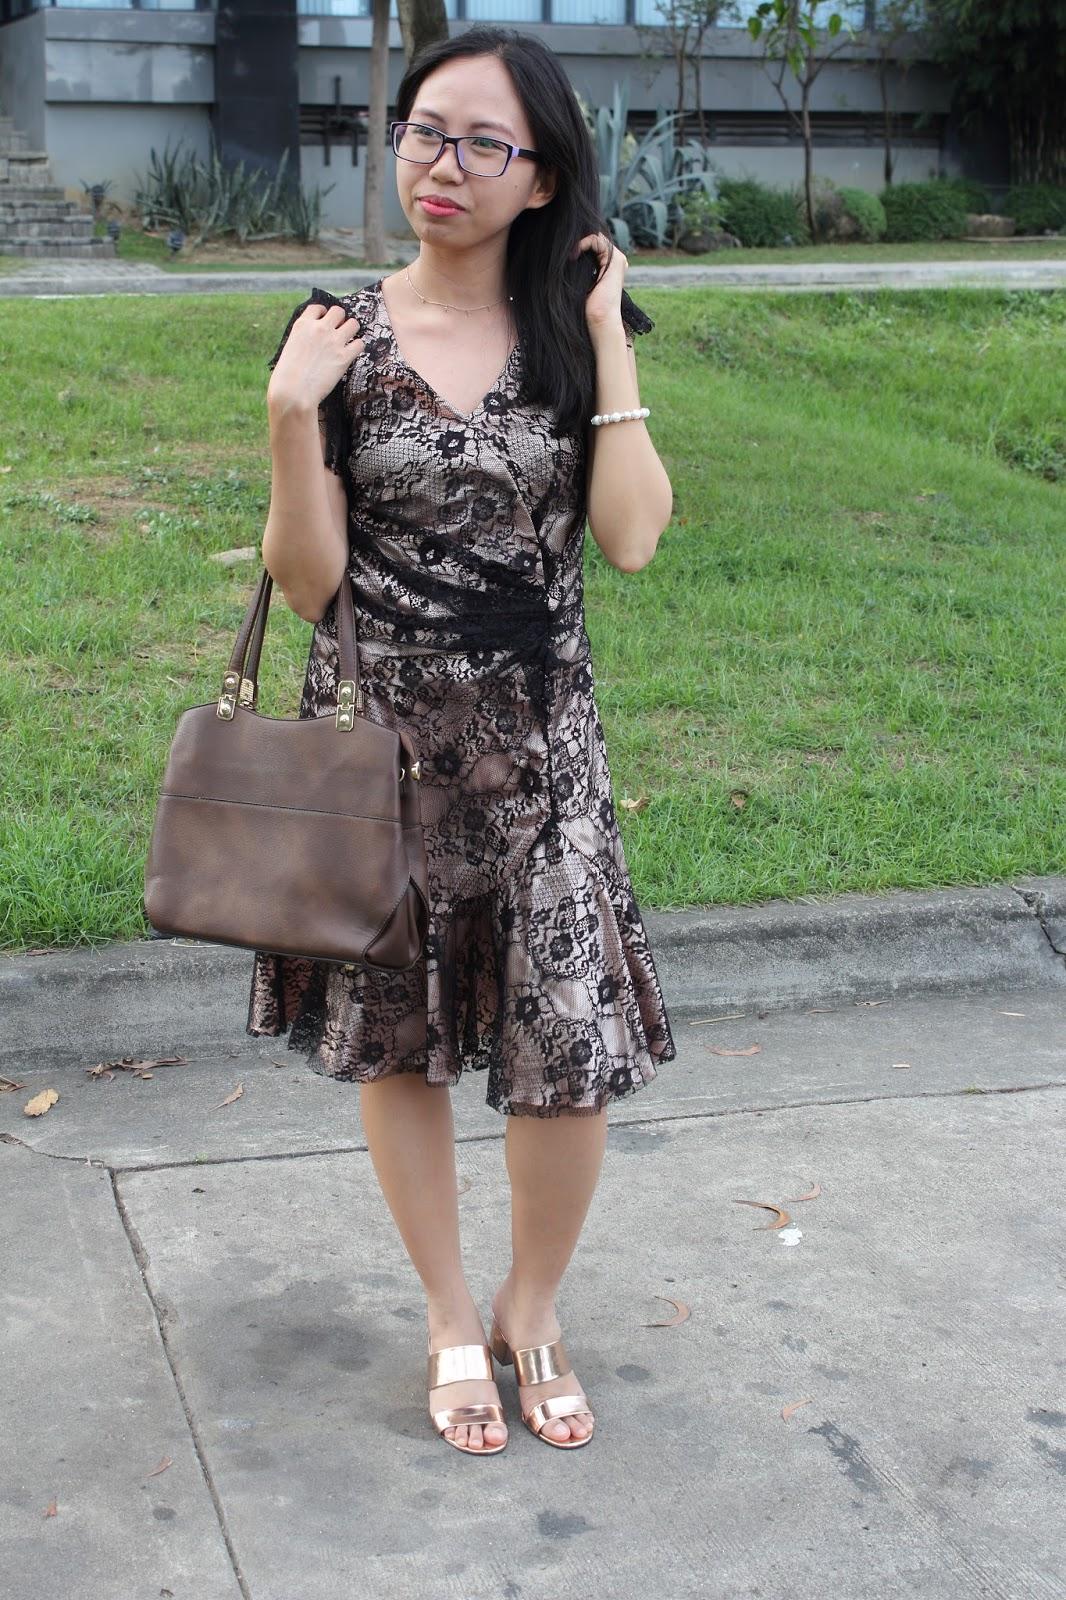 outdoor shots wearing dress